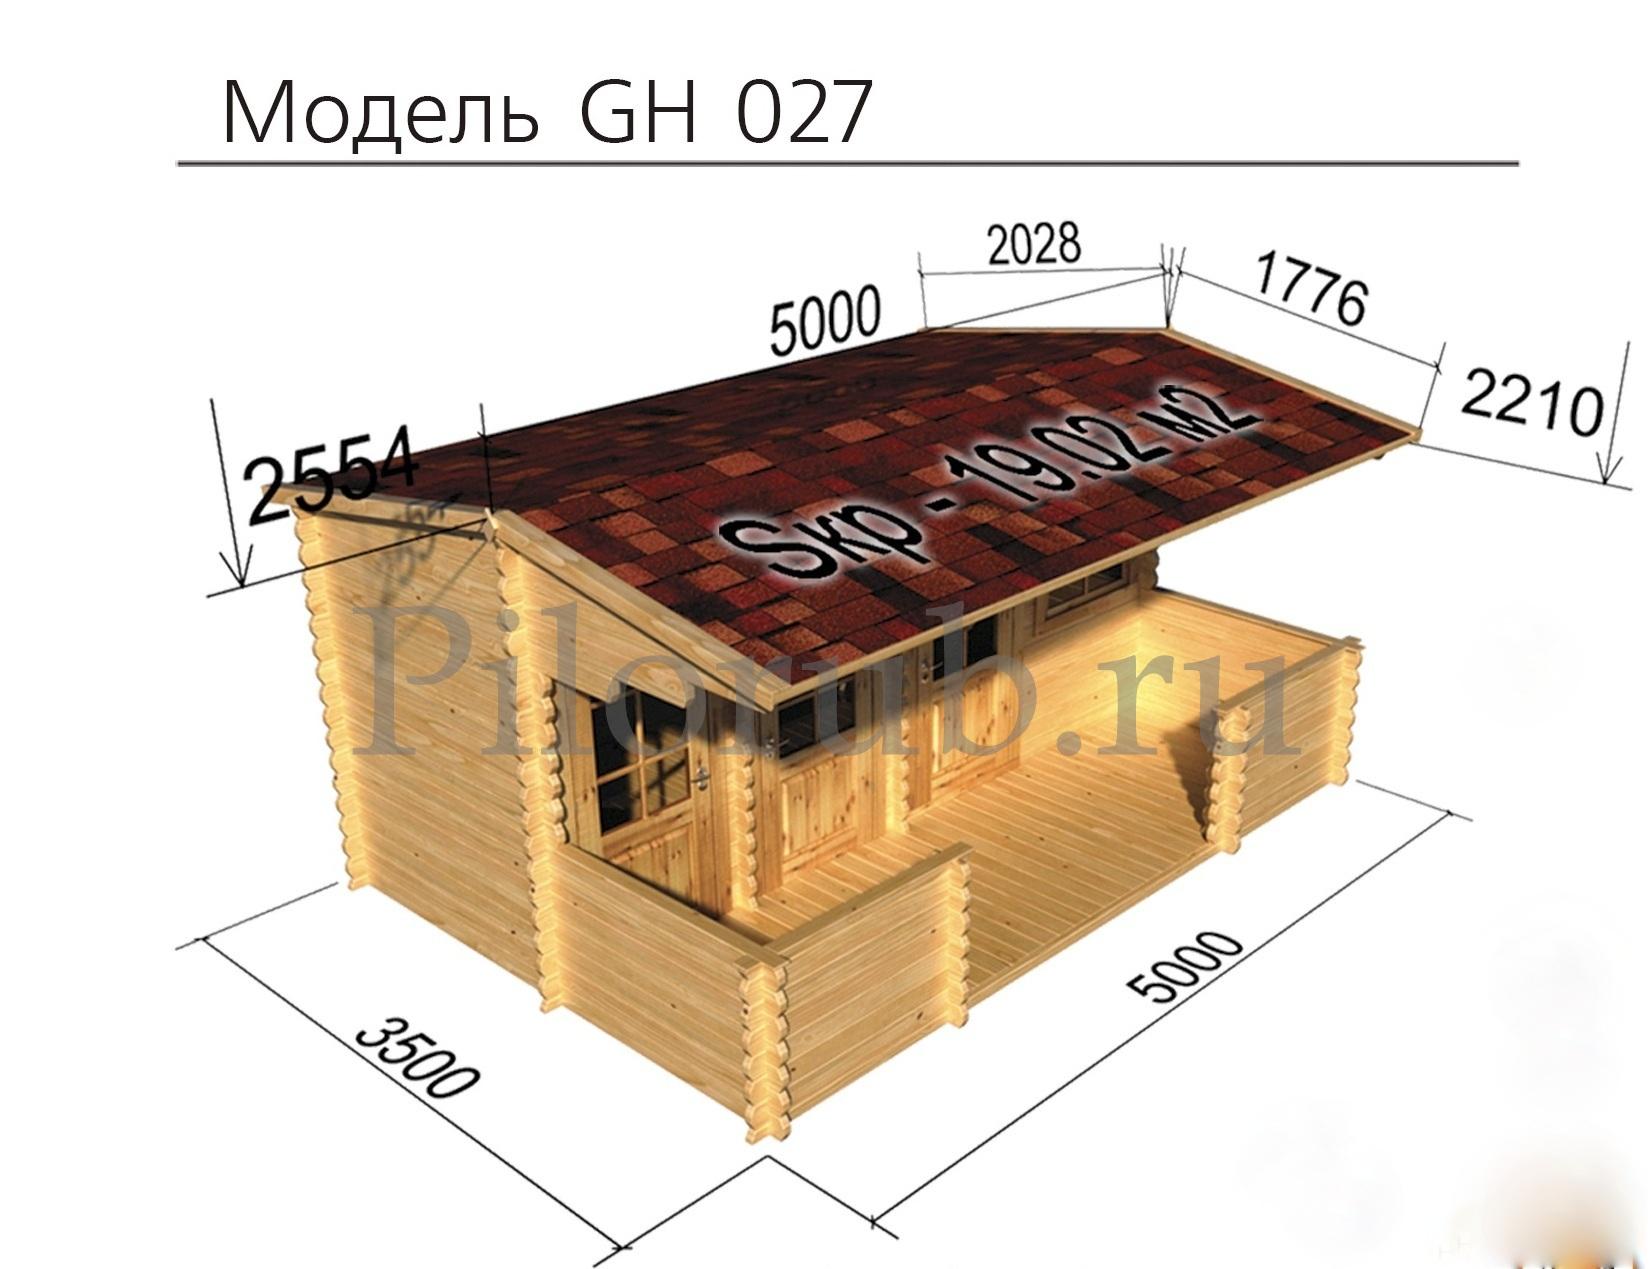 GH027